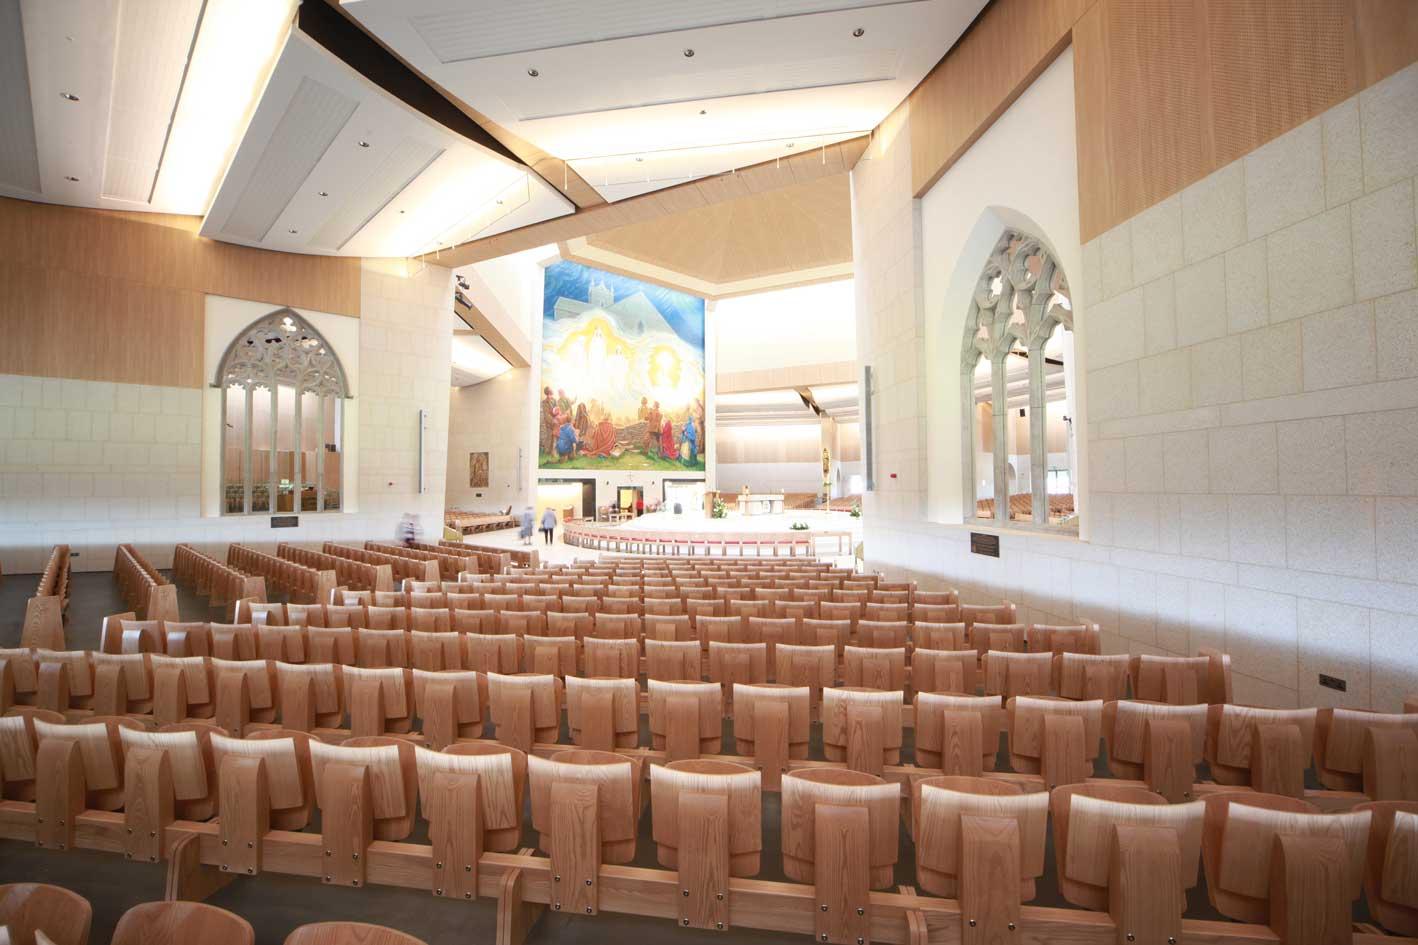 Knock Basilica auditorium flip seating innovative bespoke design (3)